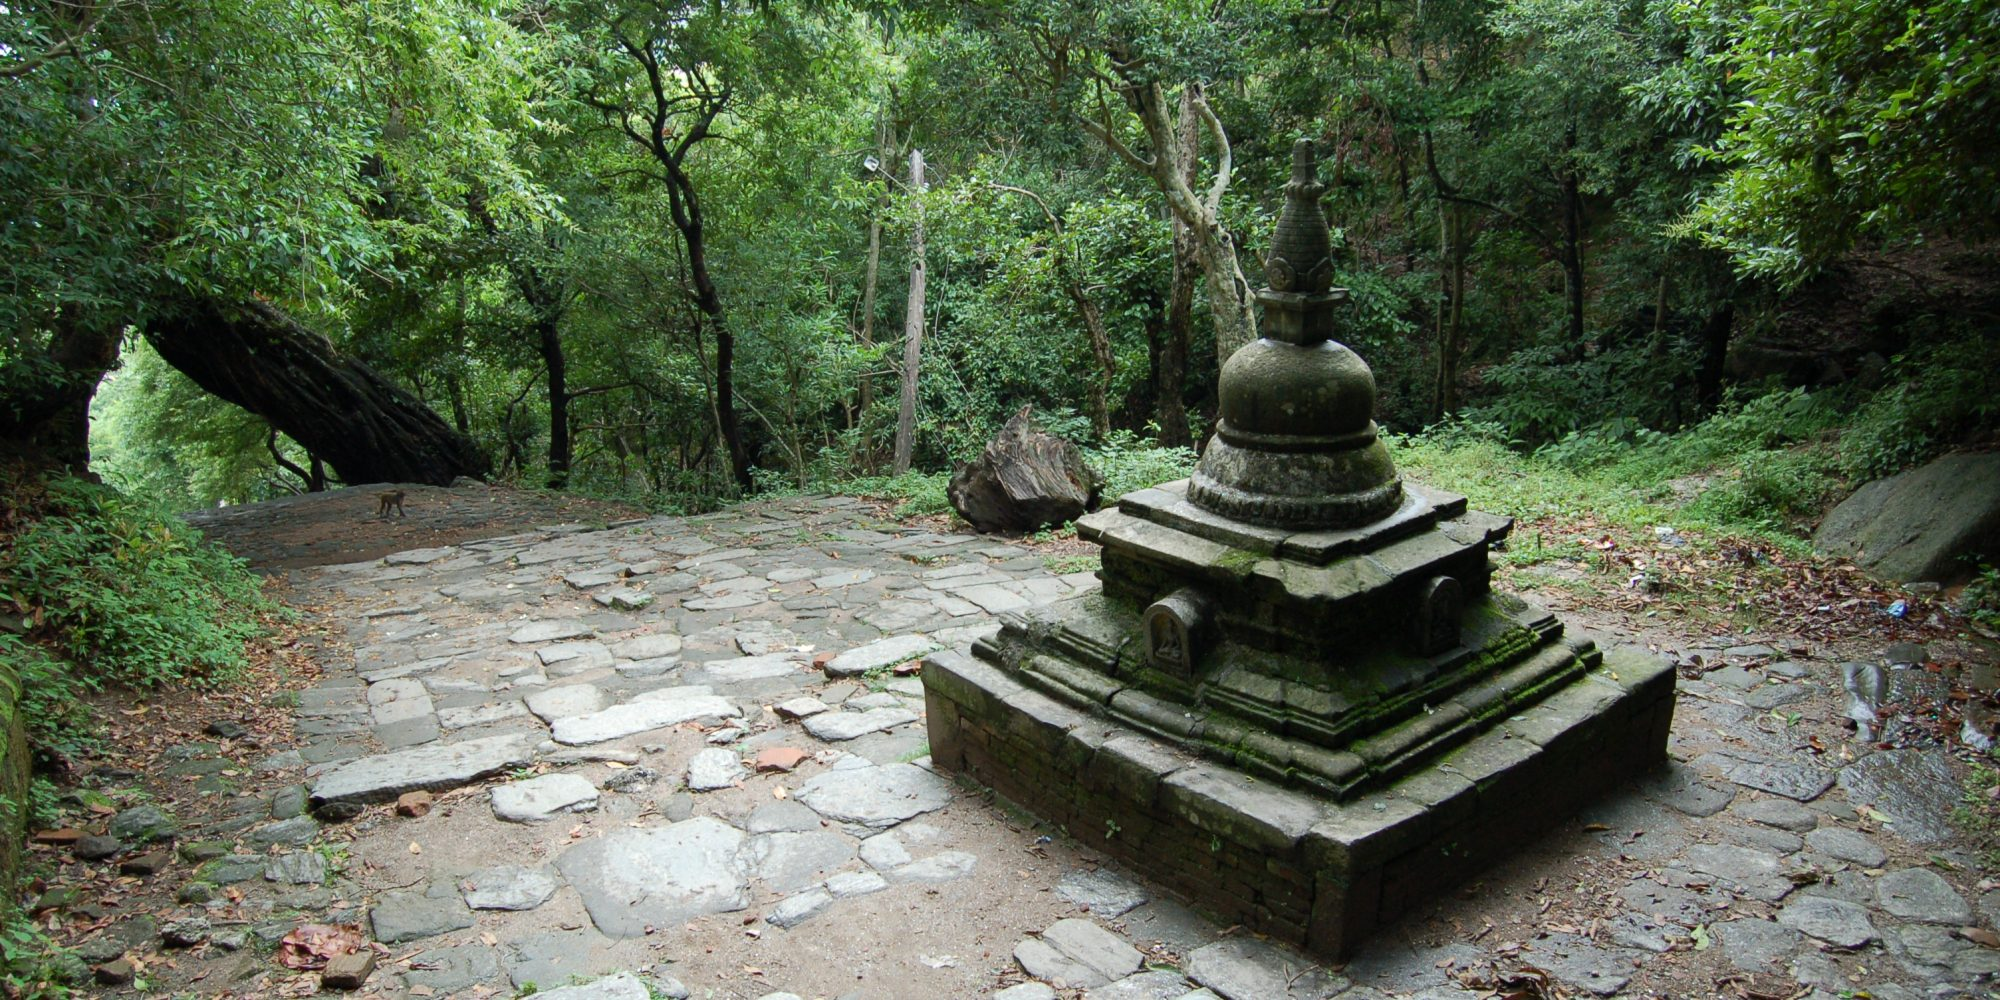 Ho Centre Sponsors Leading Buddhist Studies Conference